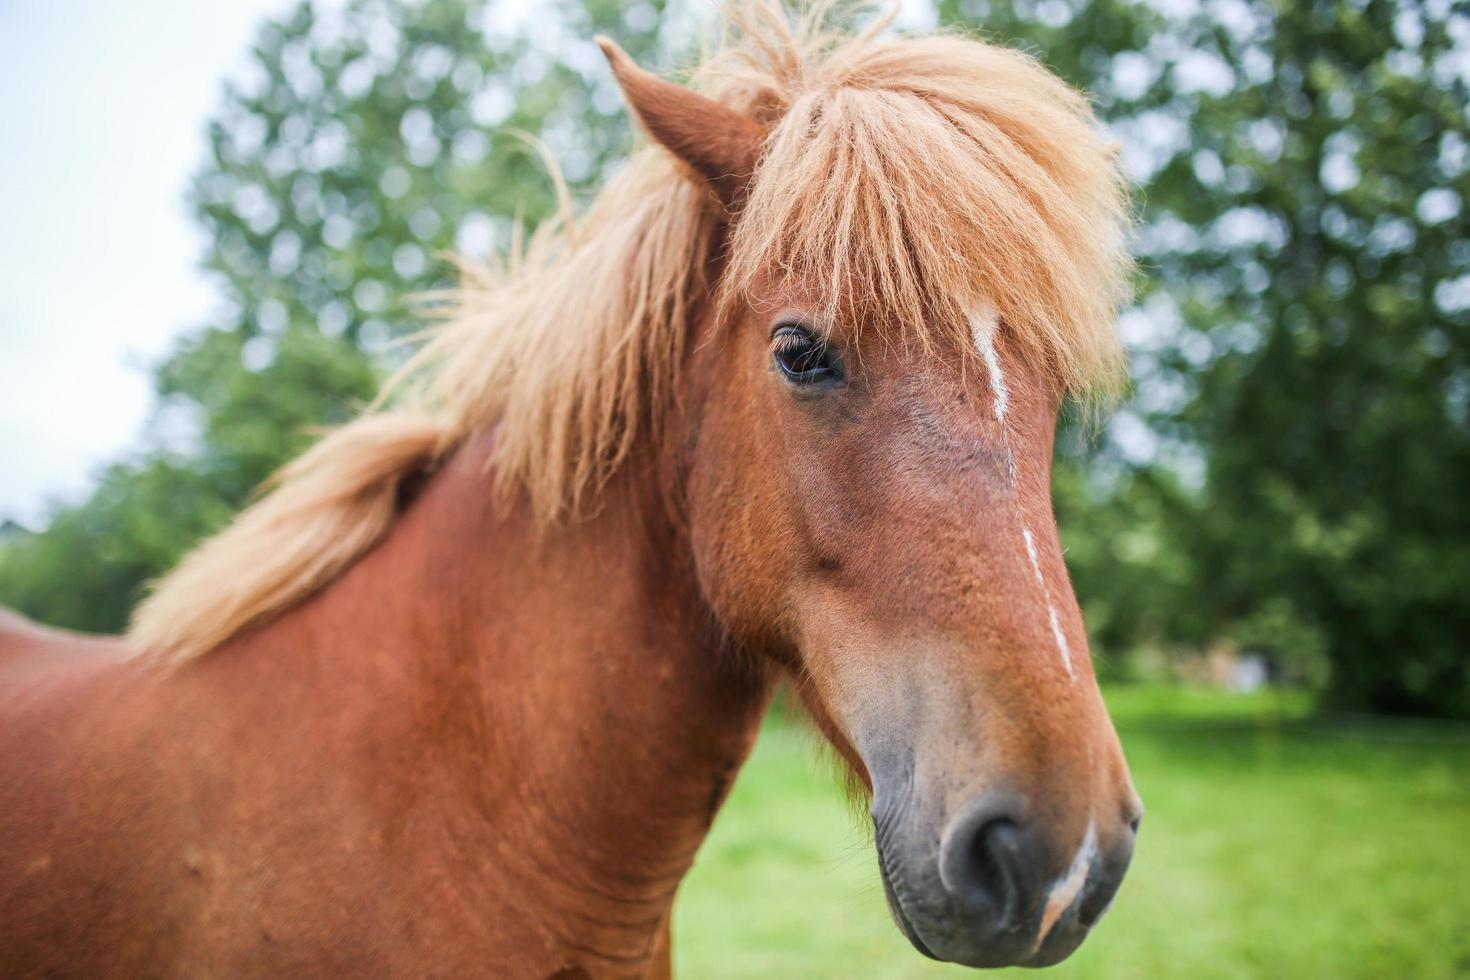 Portrait of an Icelandic horse photo